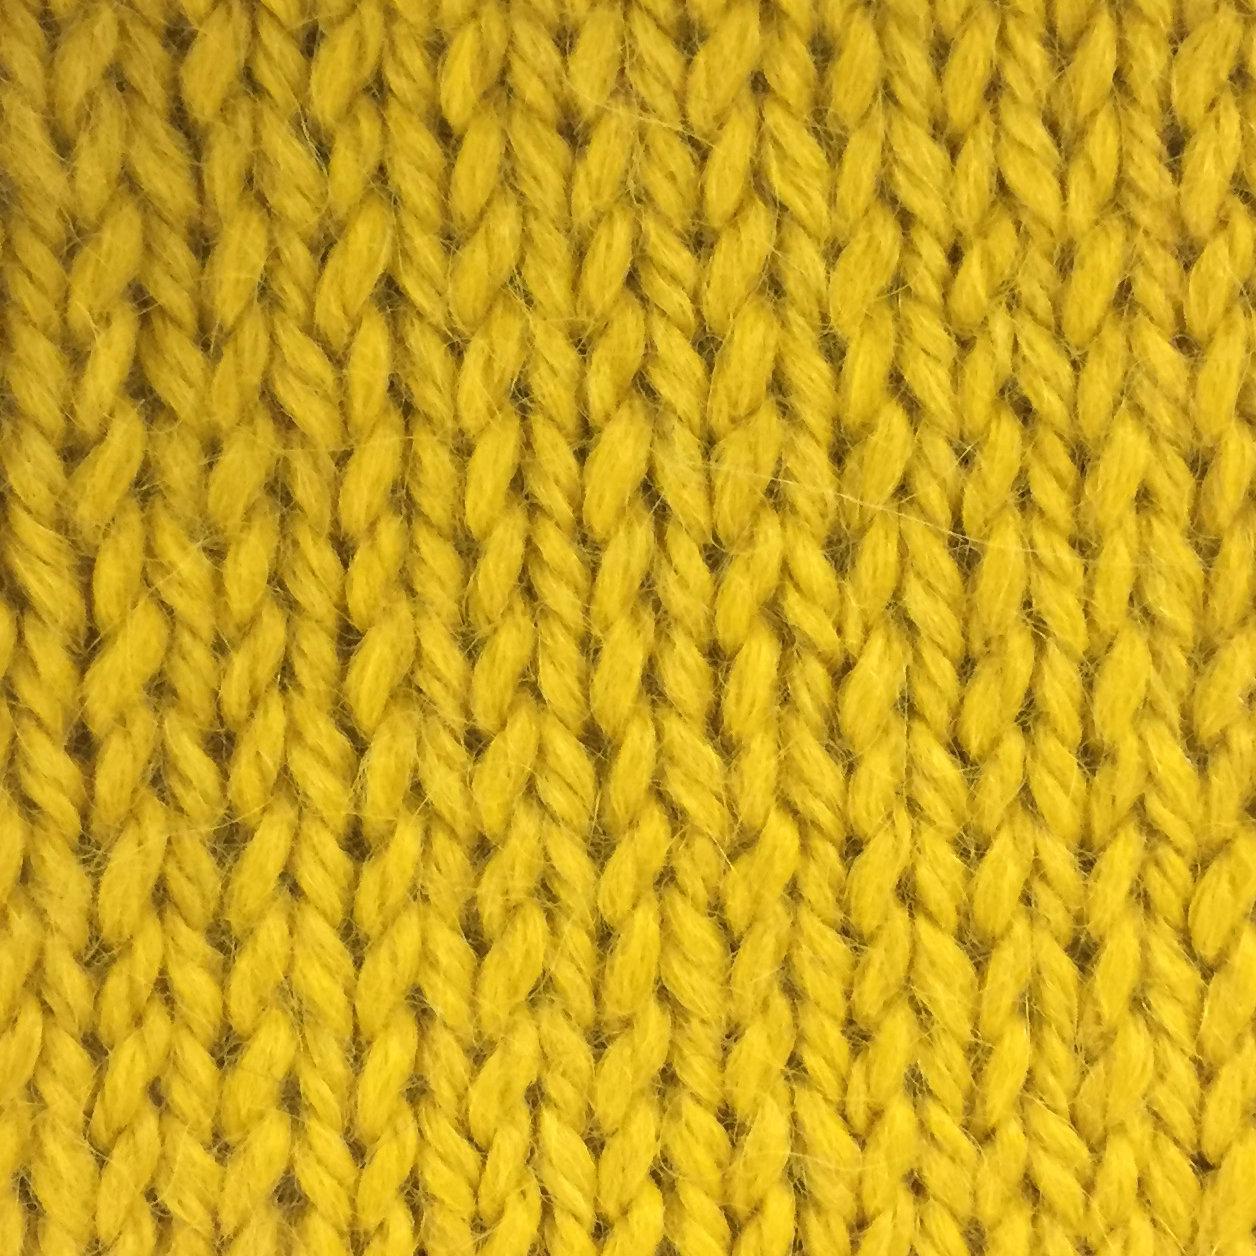 Snuggle Bulky Alpaca Blend Yarn - Sunshine AYC-6562